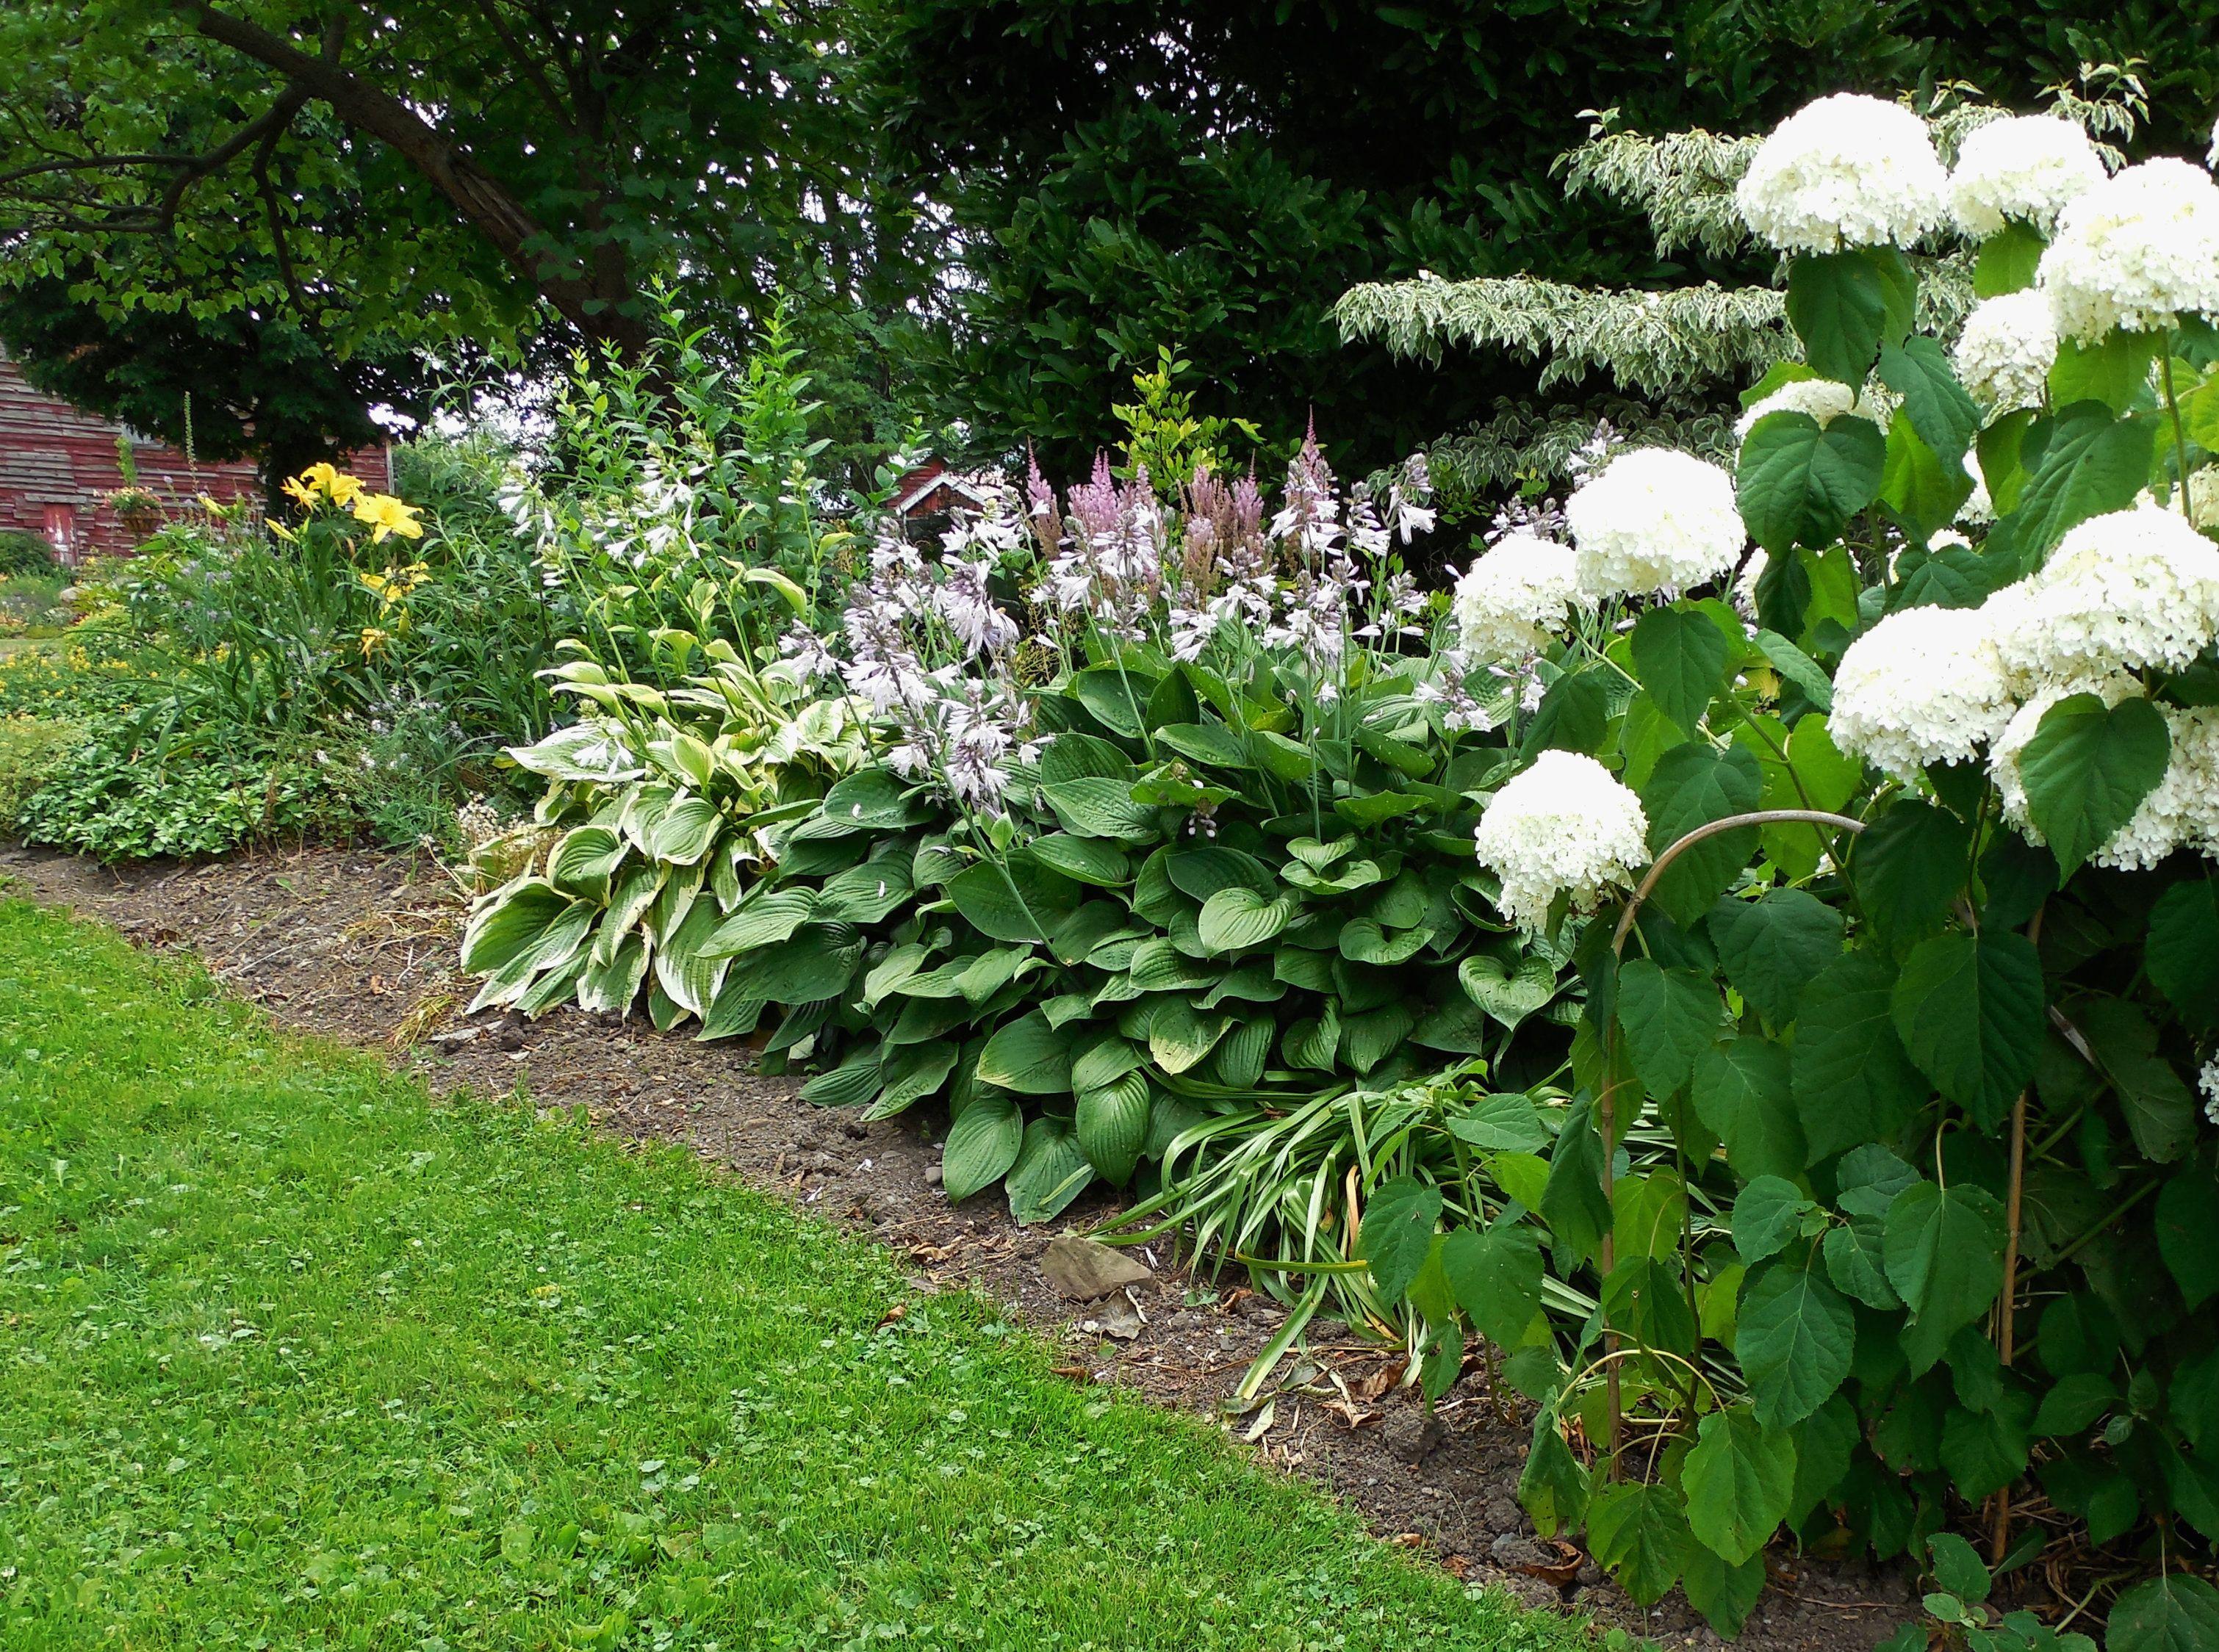 Hydrangea Day Lilies Hosta Shade Garden Day Lilies Plants